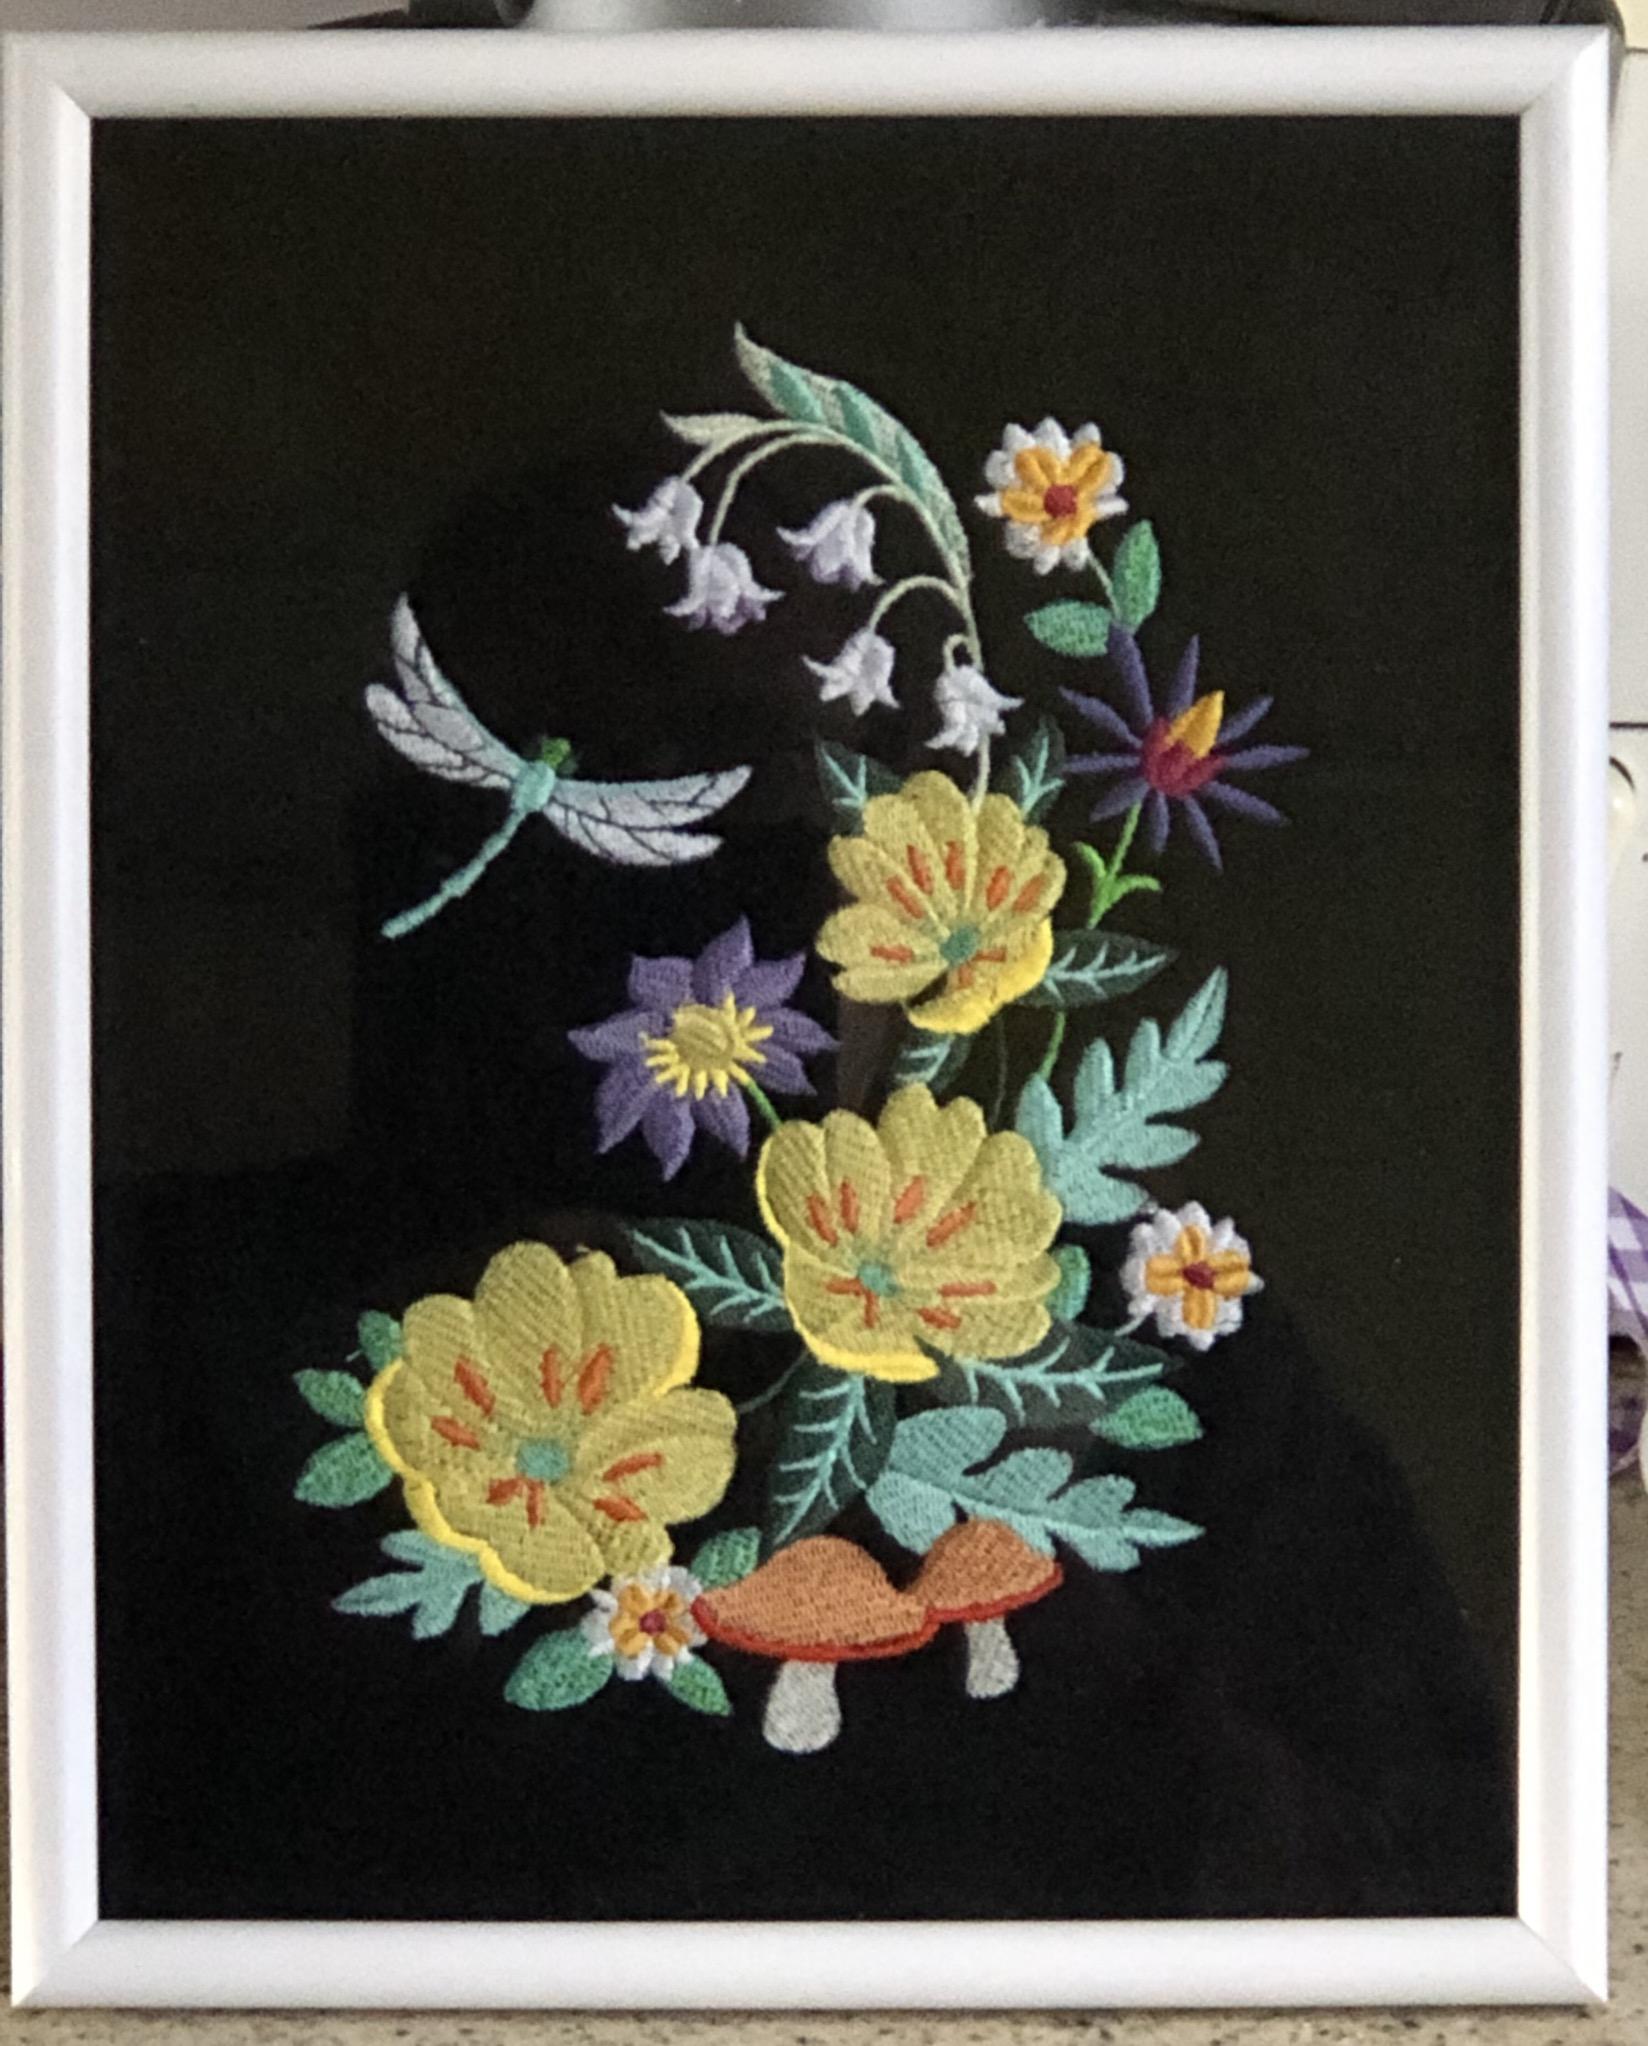 Embroidery/8C32C593-0BD5-436A-B98A-B951B050A3E2.jpeg